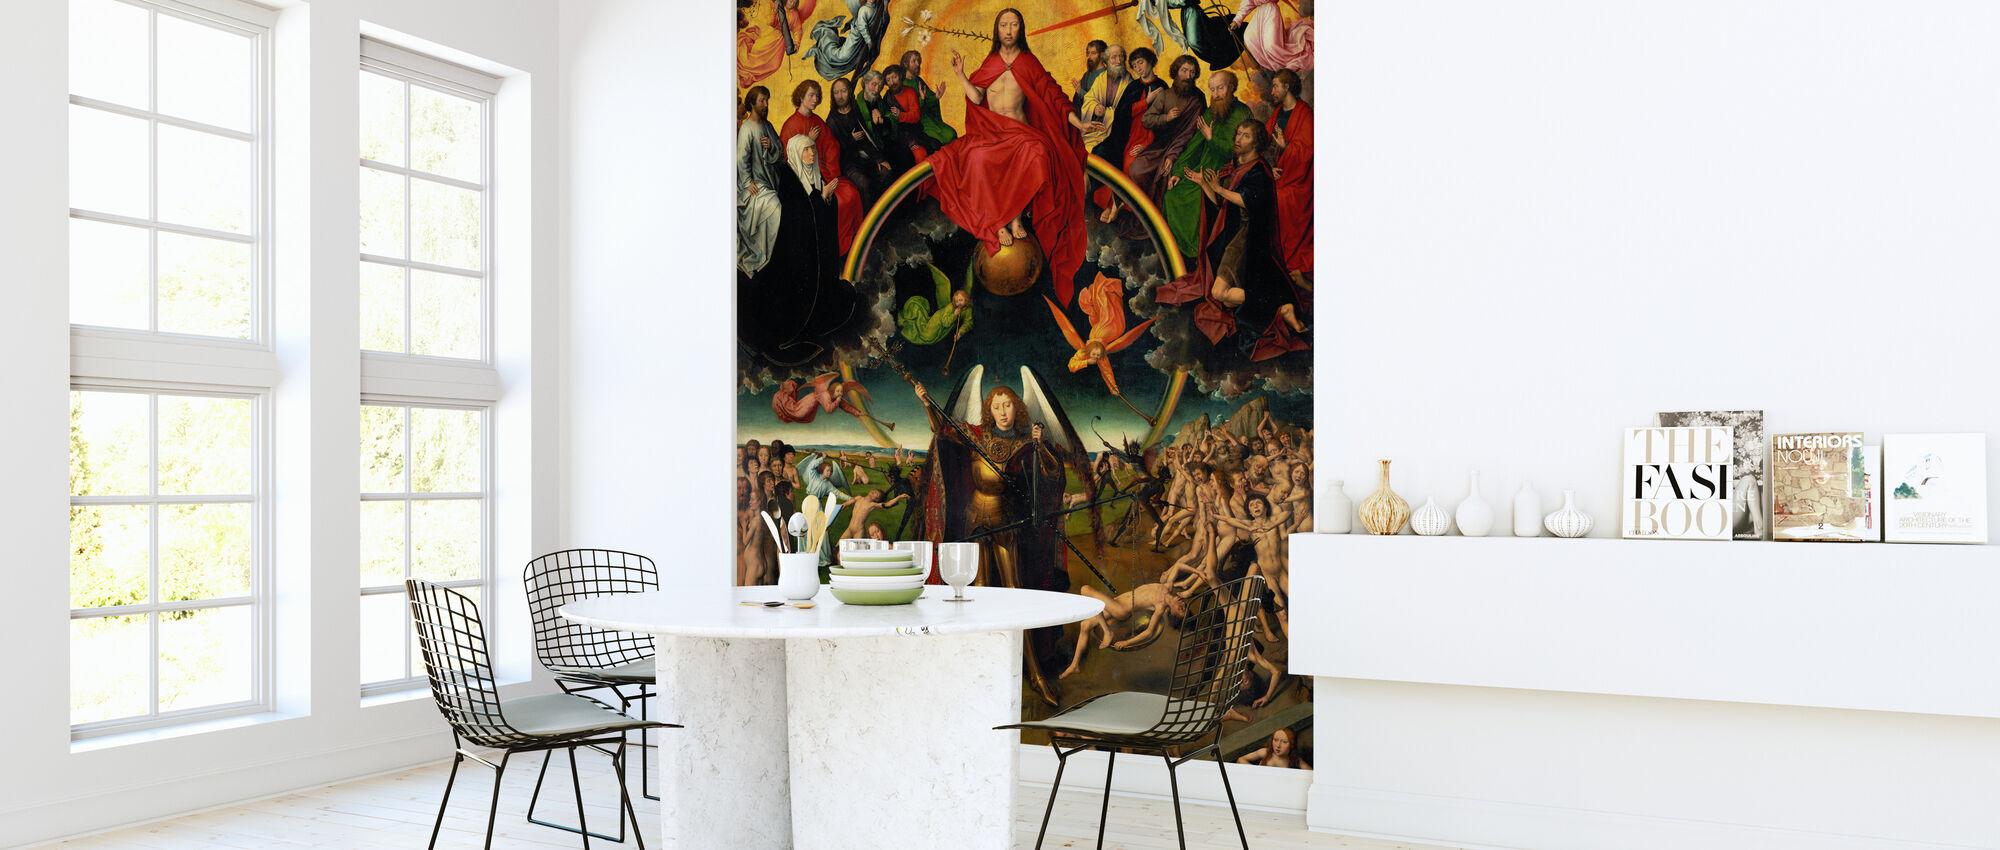 Last Judgement - Hans Memling - Wallpaper - Kitchen